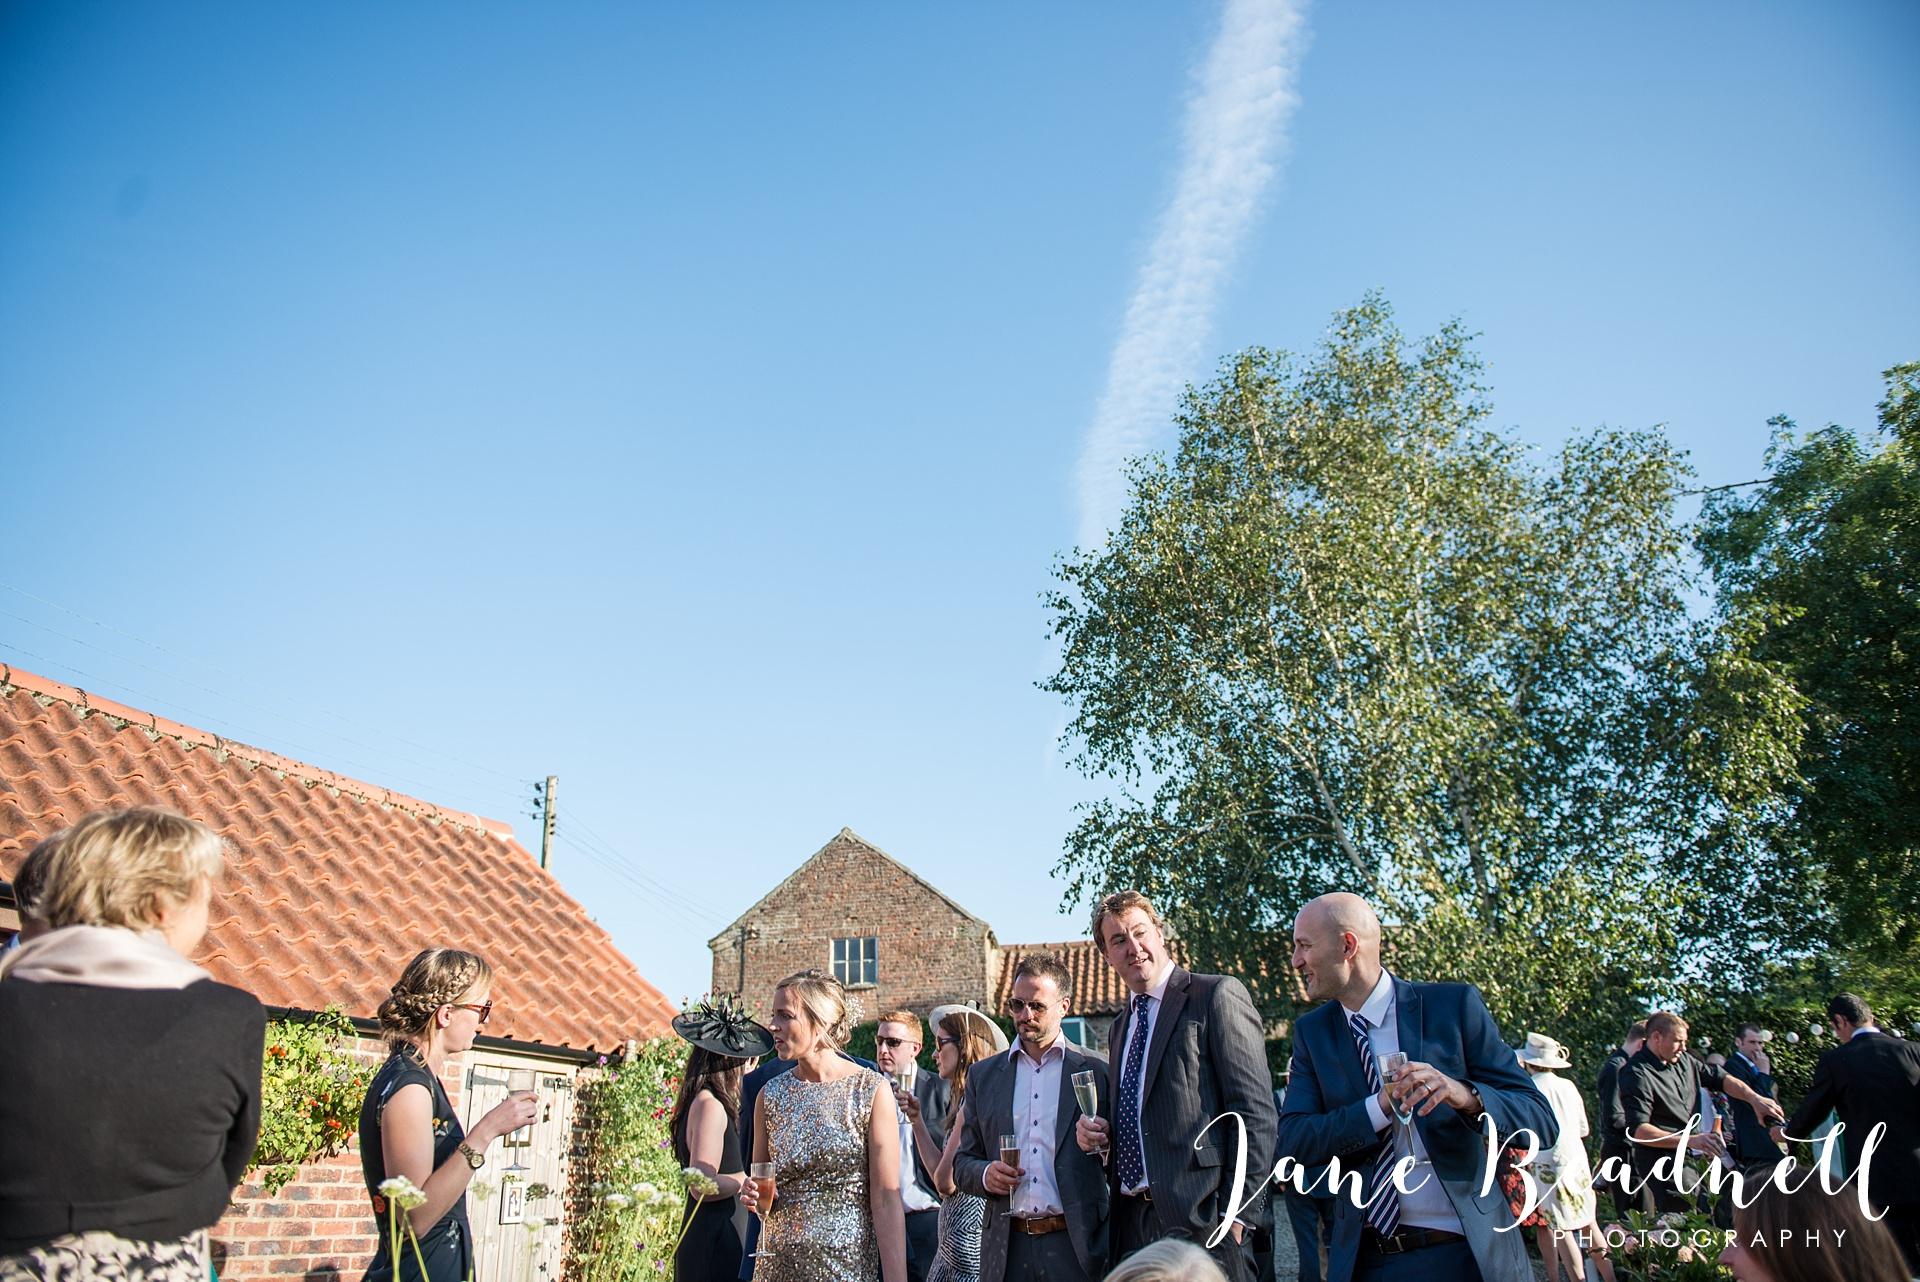 fine-art-wedding-photographer-jane-beadnell-yorkshire-wedding-photographer_0092